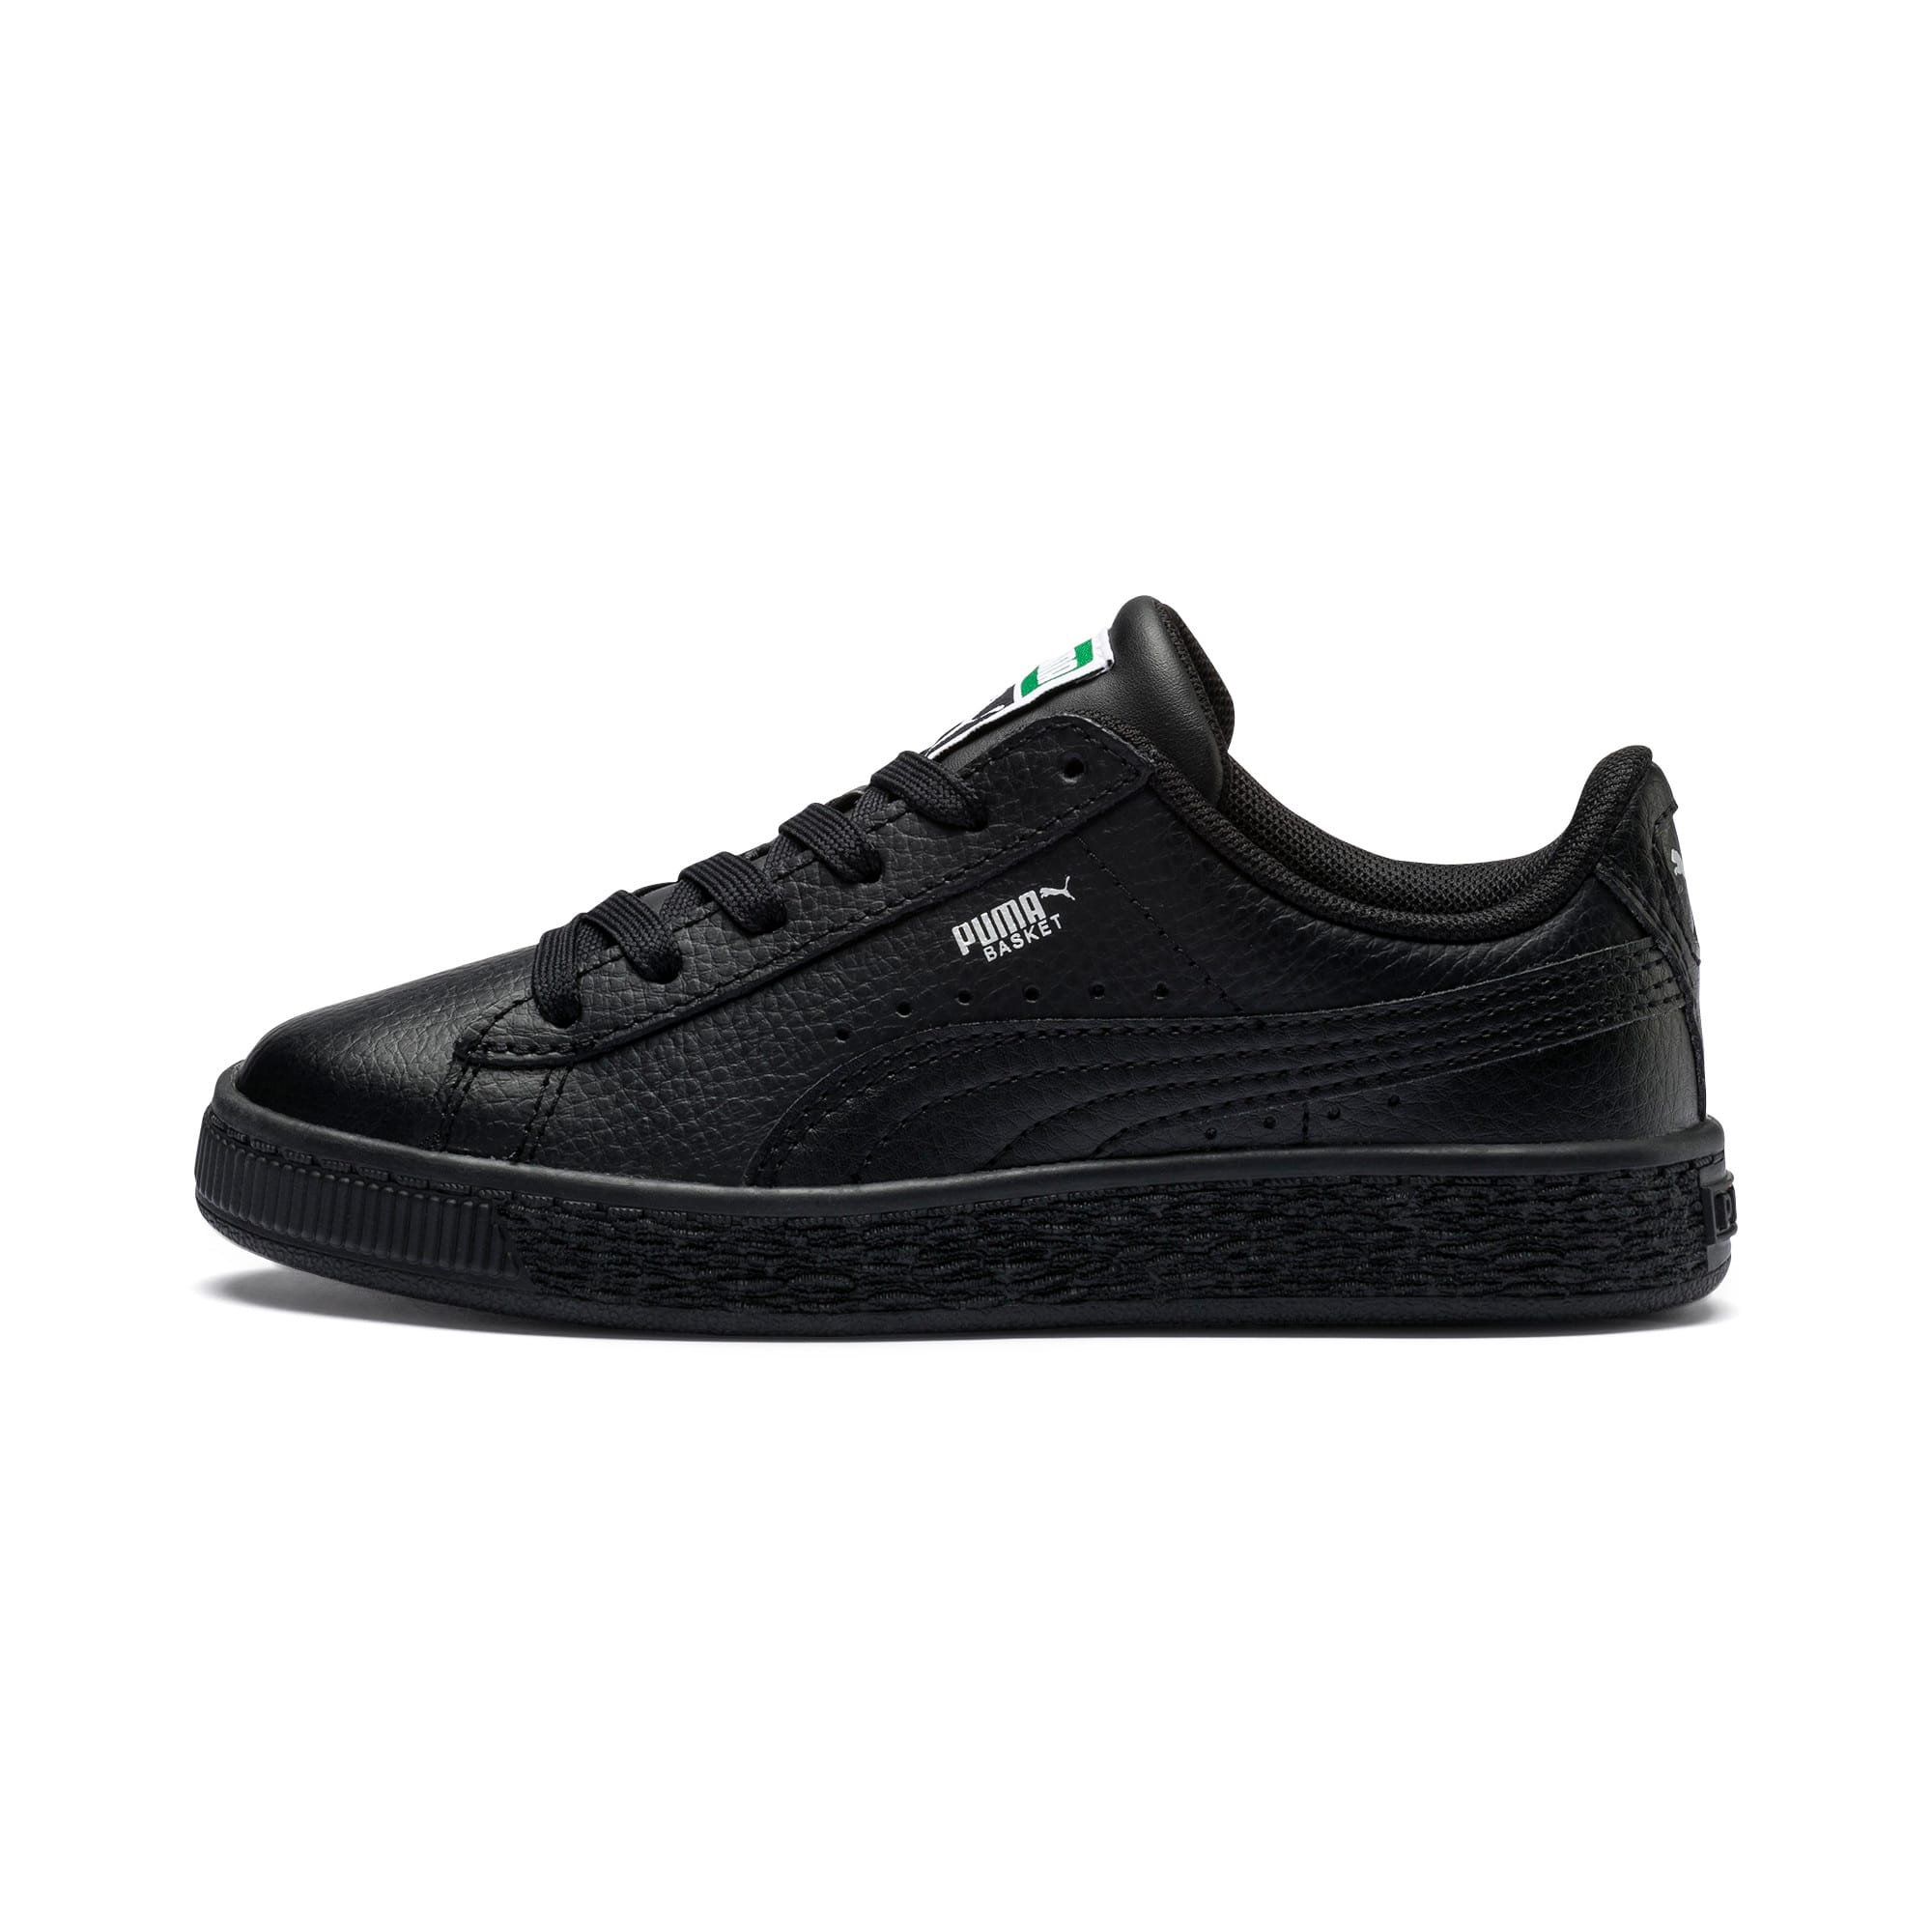 Thumbnail 1 of Basket Classic Little Kids' Shoes, Puma Black-Puma Black, medium